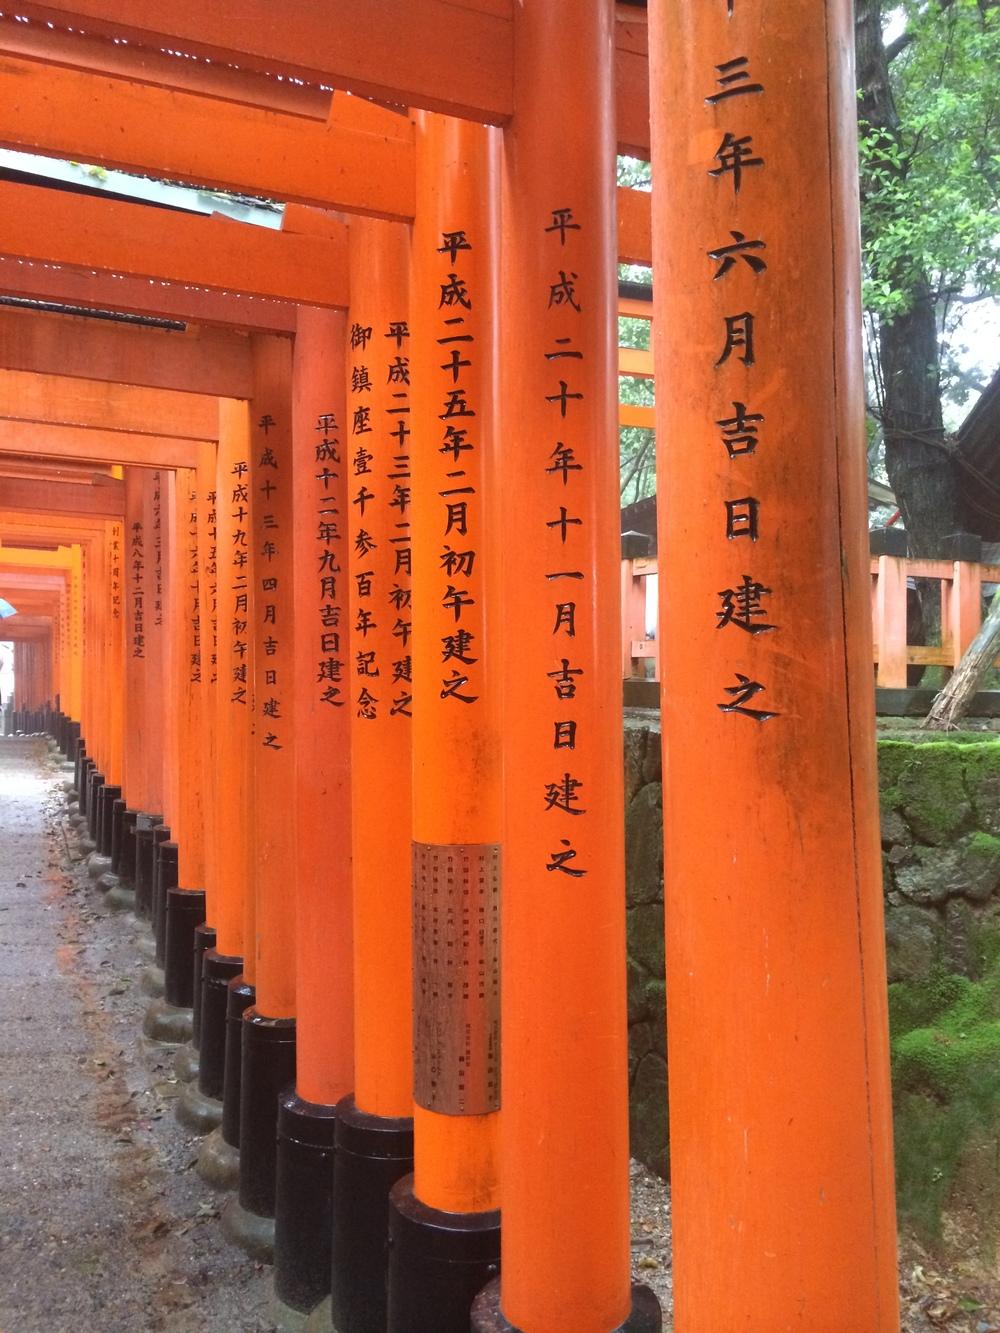 Torii gate detail, Fushimi Inari Taisha